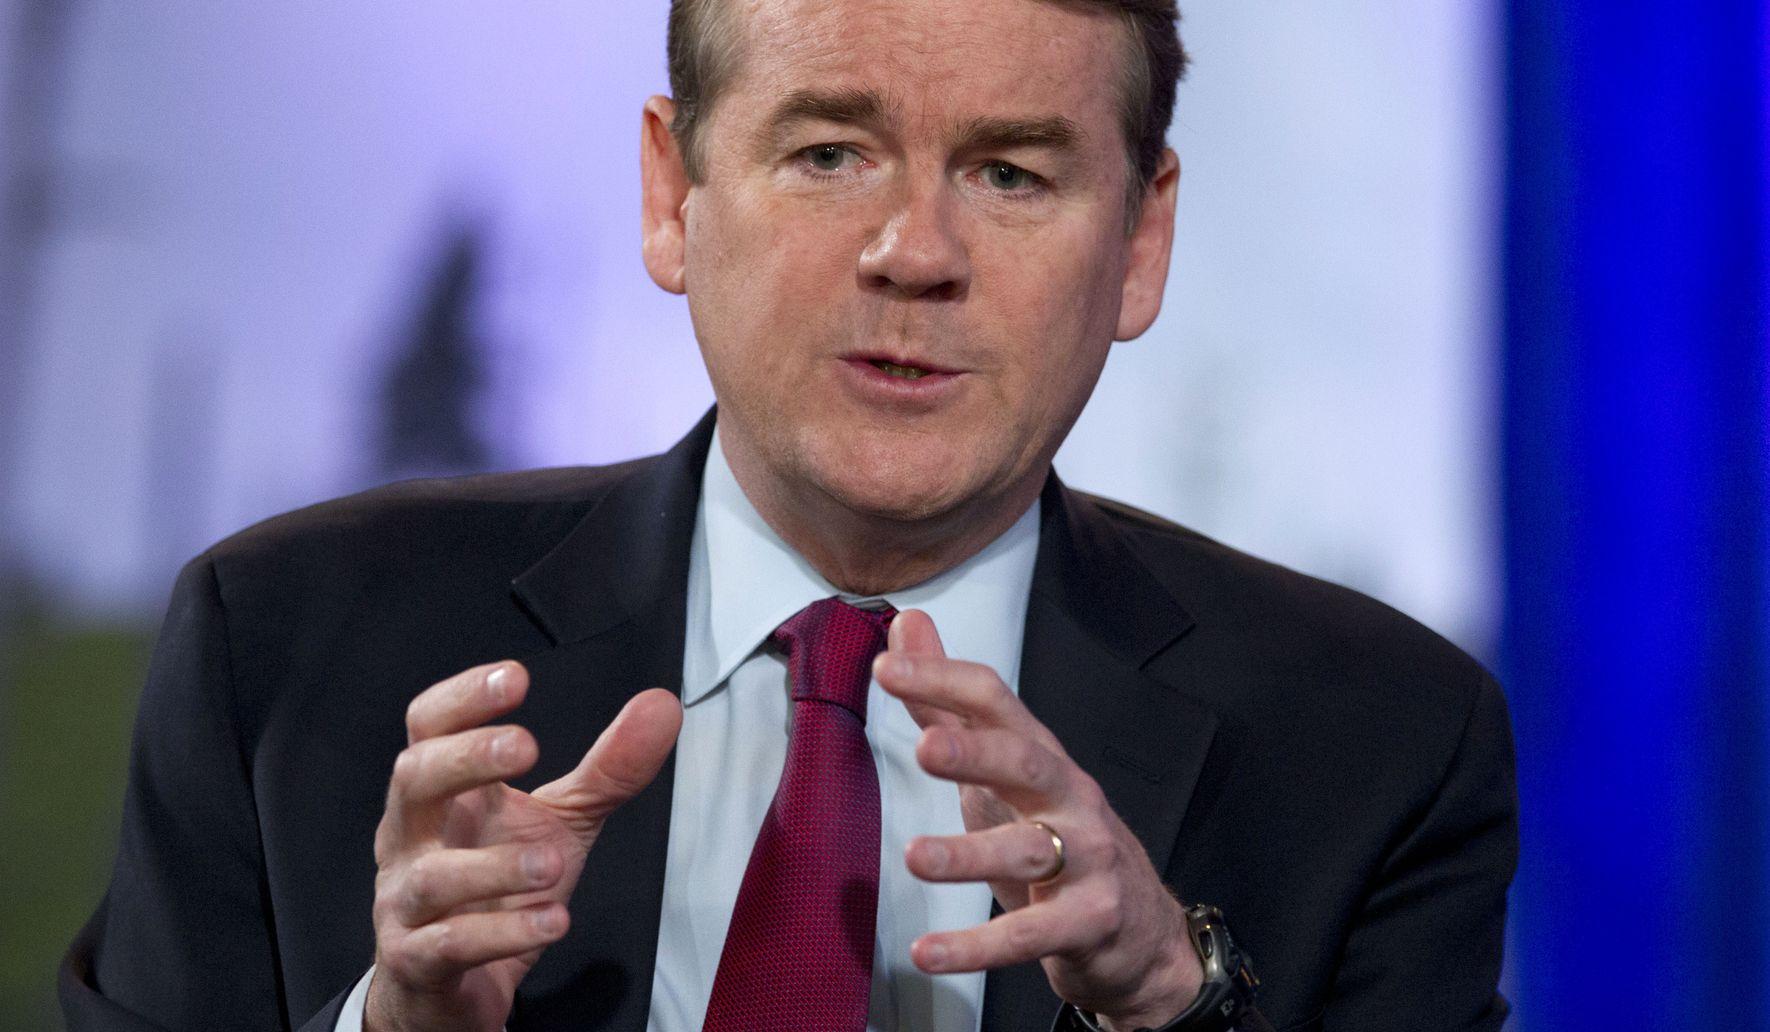 Michael Bennet's charmed political career hits snag as presidential bid stalls